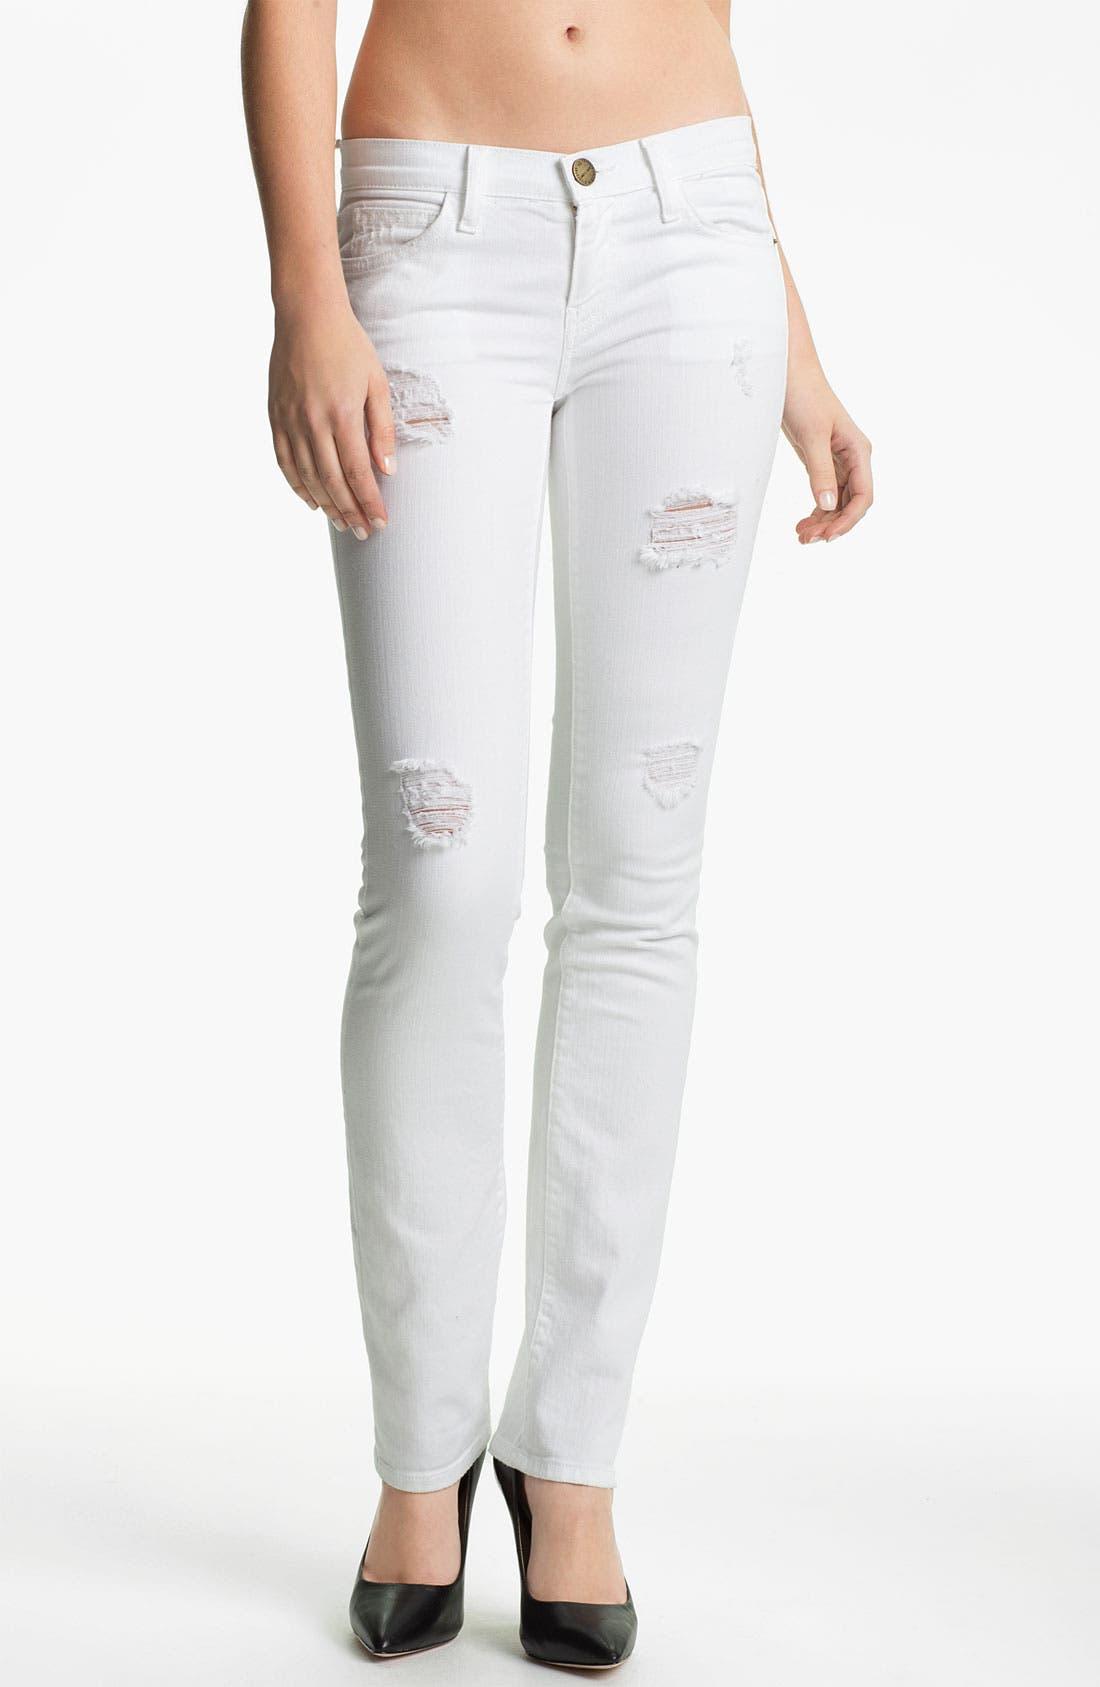 Alternate Image 1 Selected - Current/Elliott 'The Straight Leg' Destroyed Stretch Jeans (Sugar Destroy)